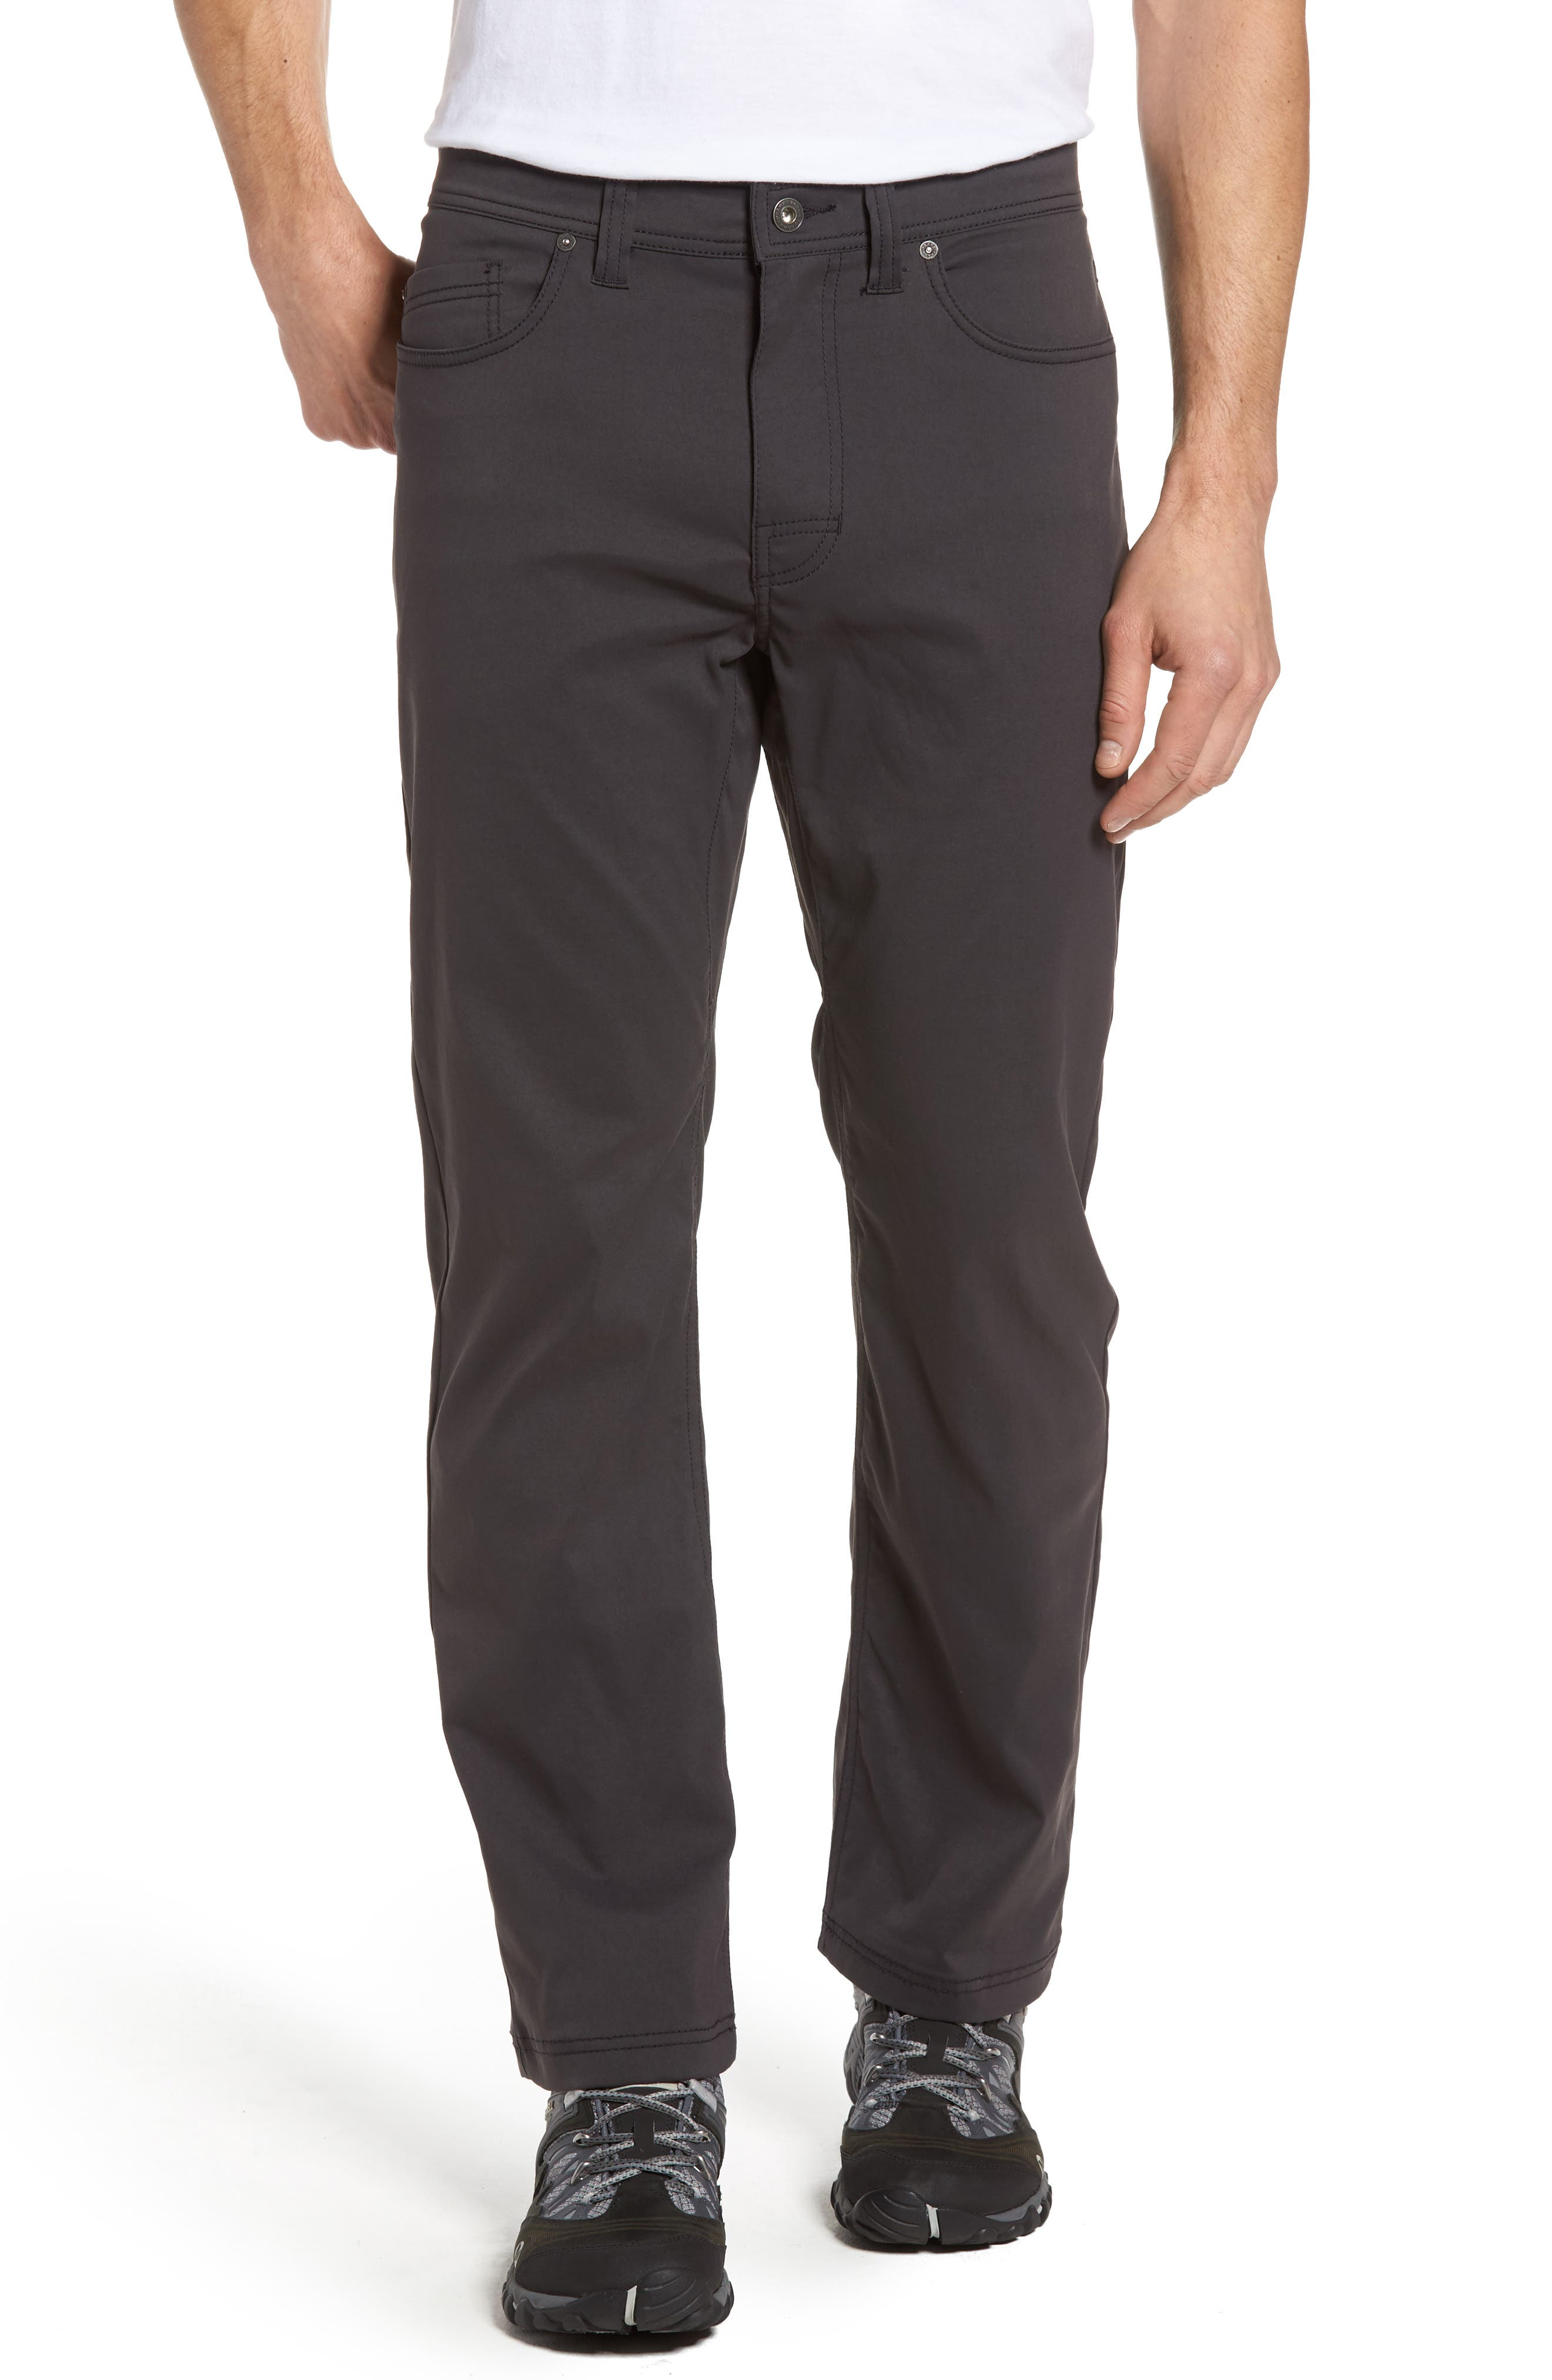 Alternate Image 1 Selected - prAna Brion Slim Fit Pants